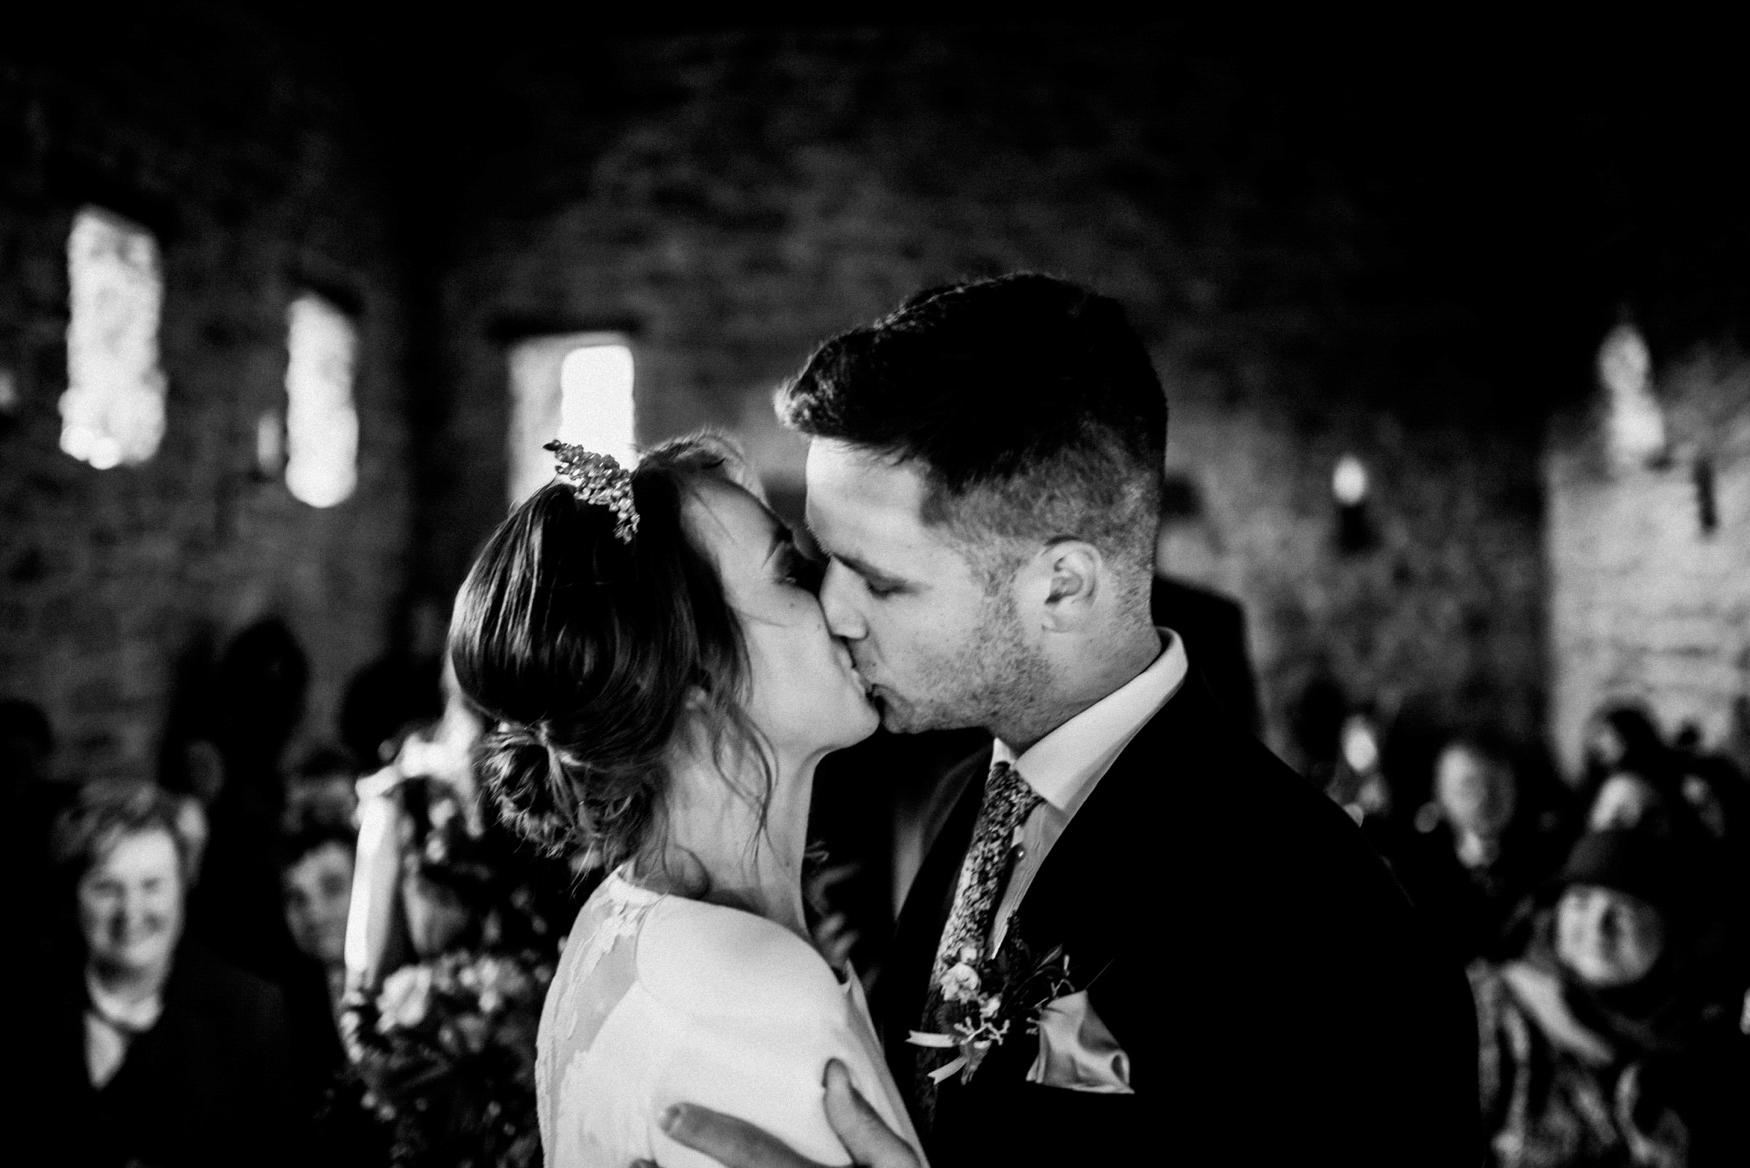 2 prague wedding photographer - boho svatba zikmundov023.jpg